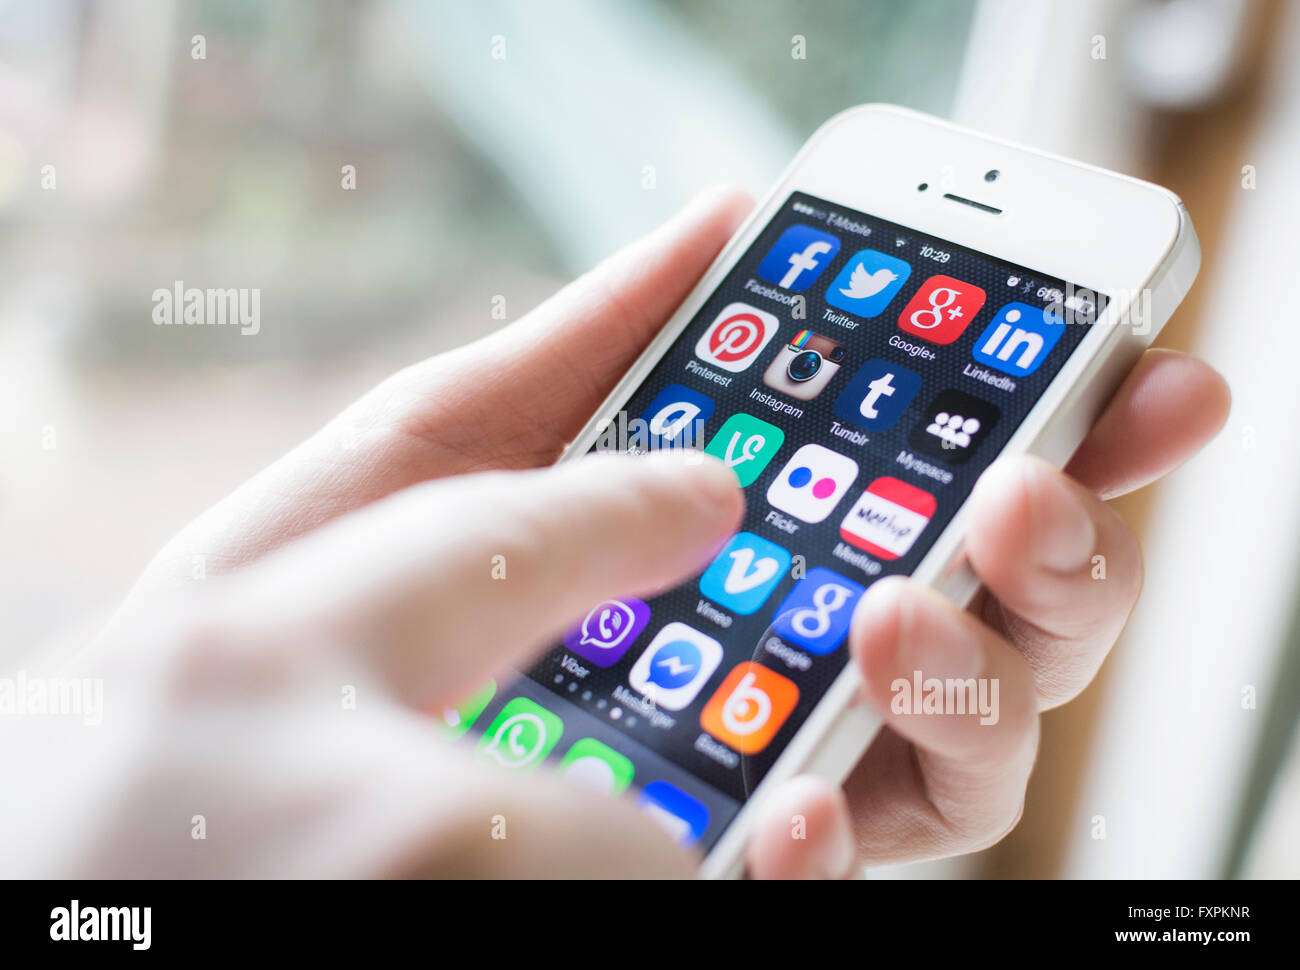 Social media on smartphone screen - Stock Image